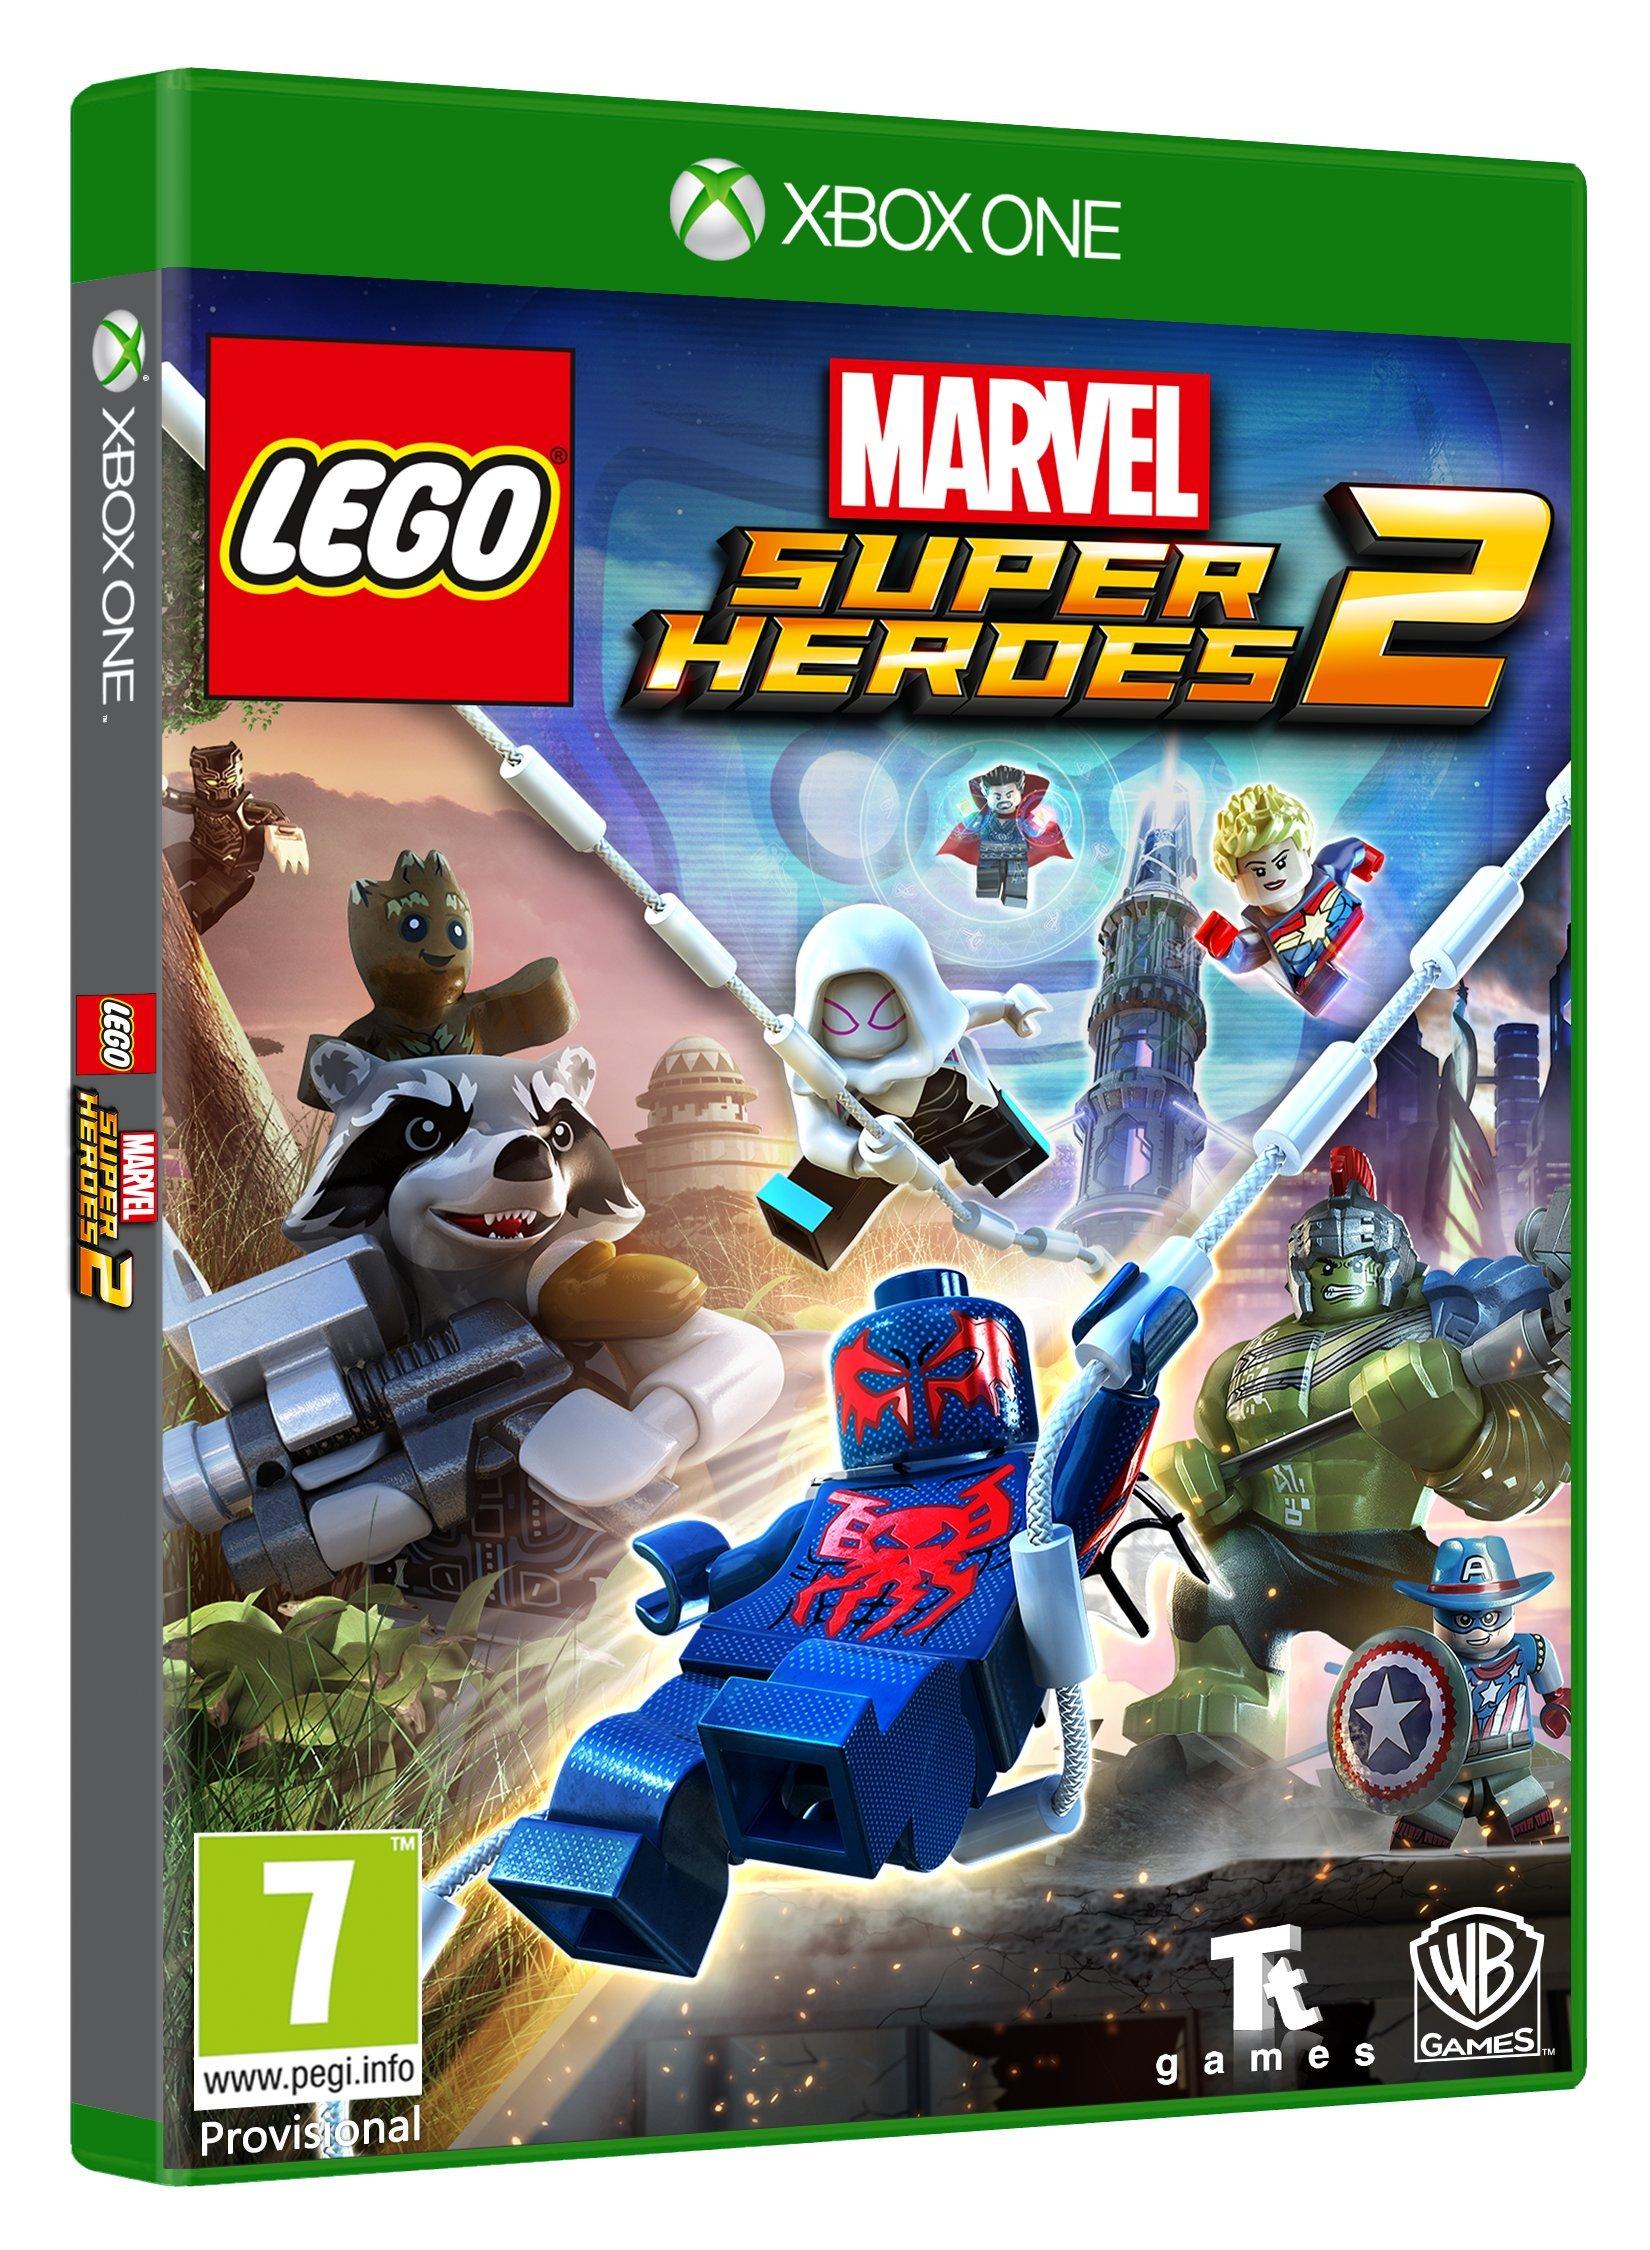 LEGO Marvel Superheroes 2 - Xbox One by Warner Bros. (Image #2)